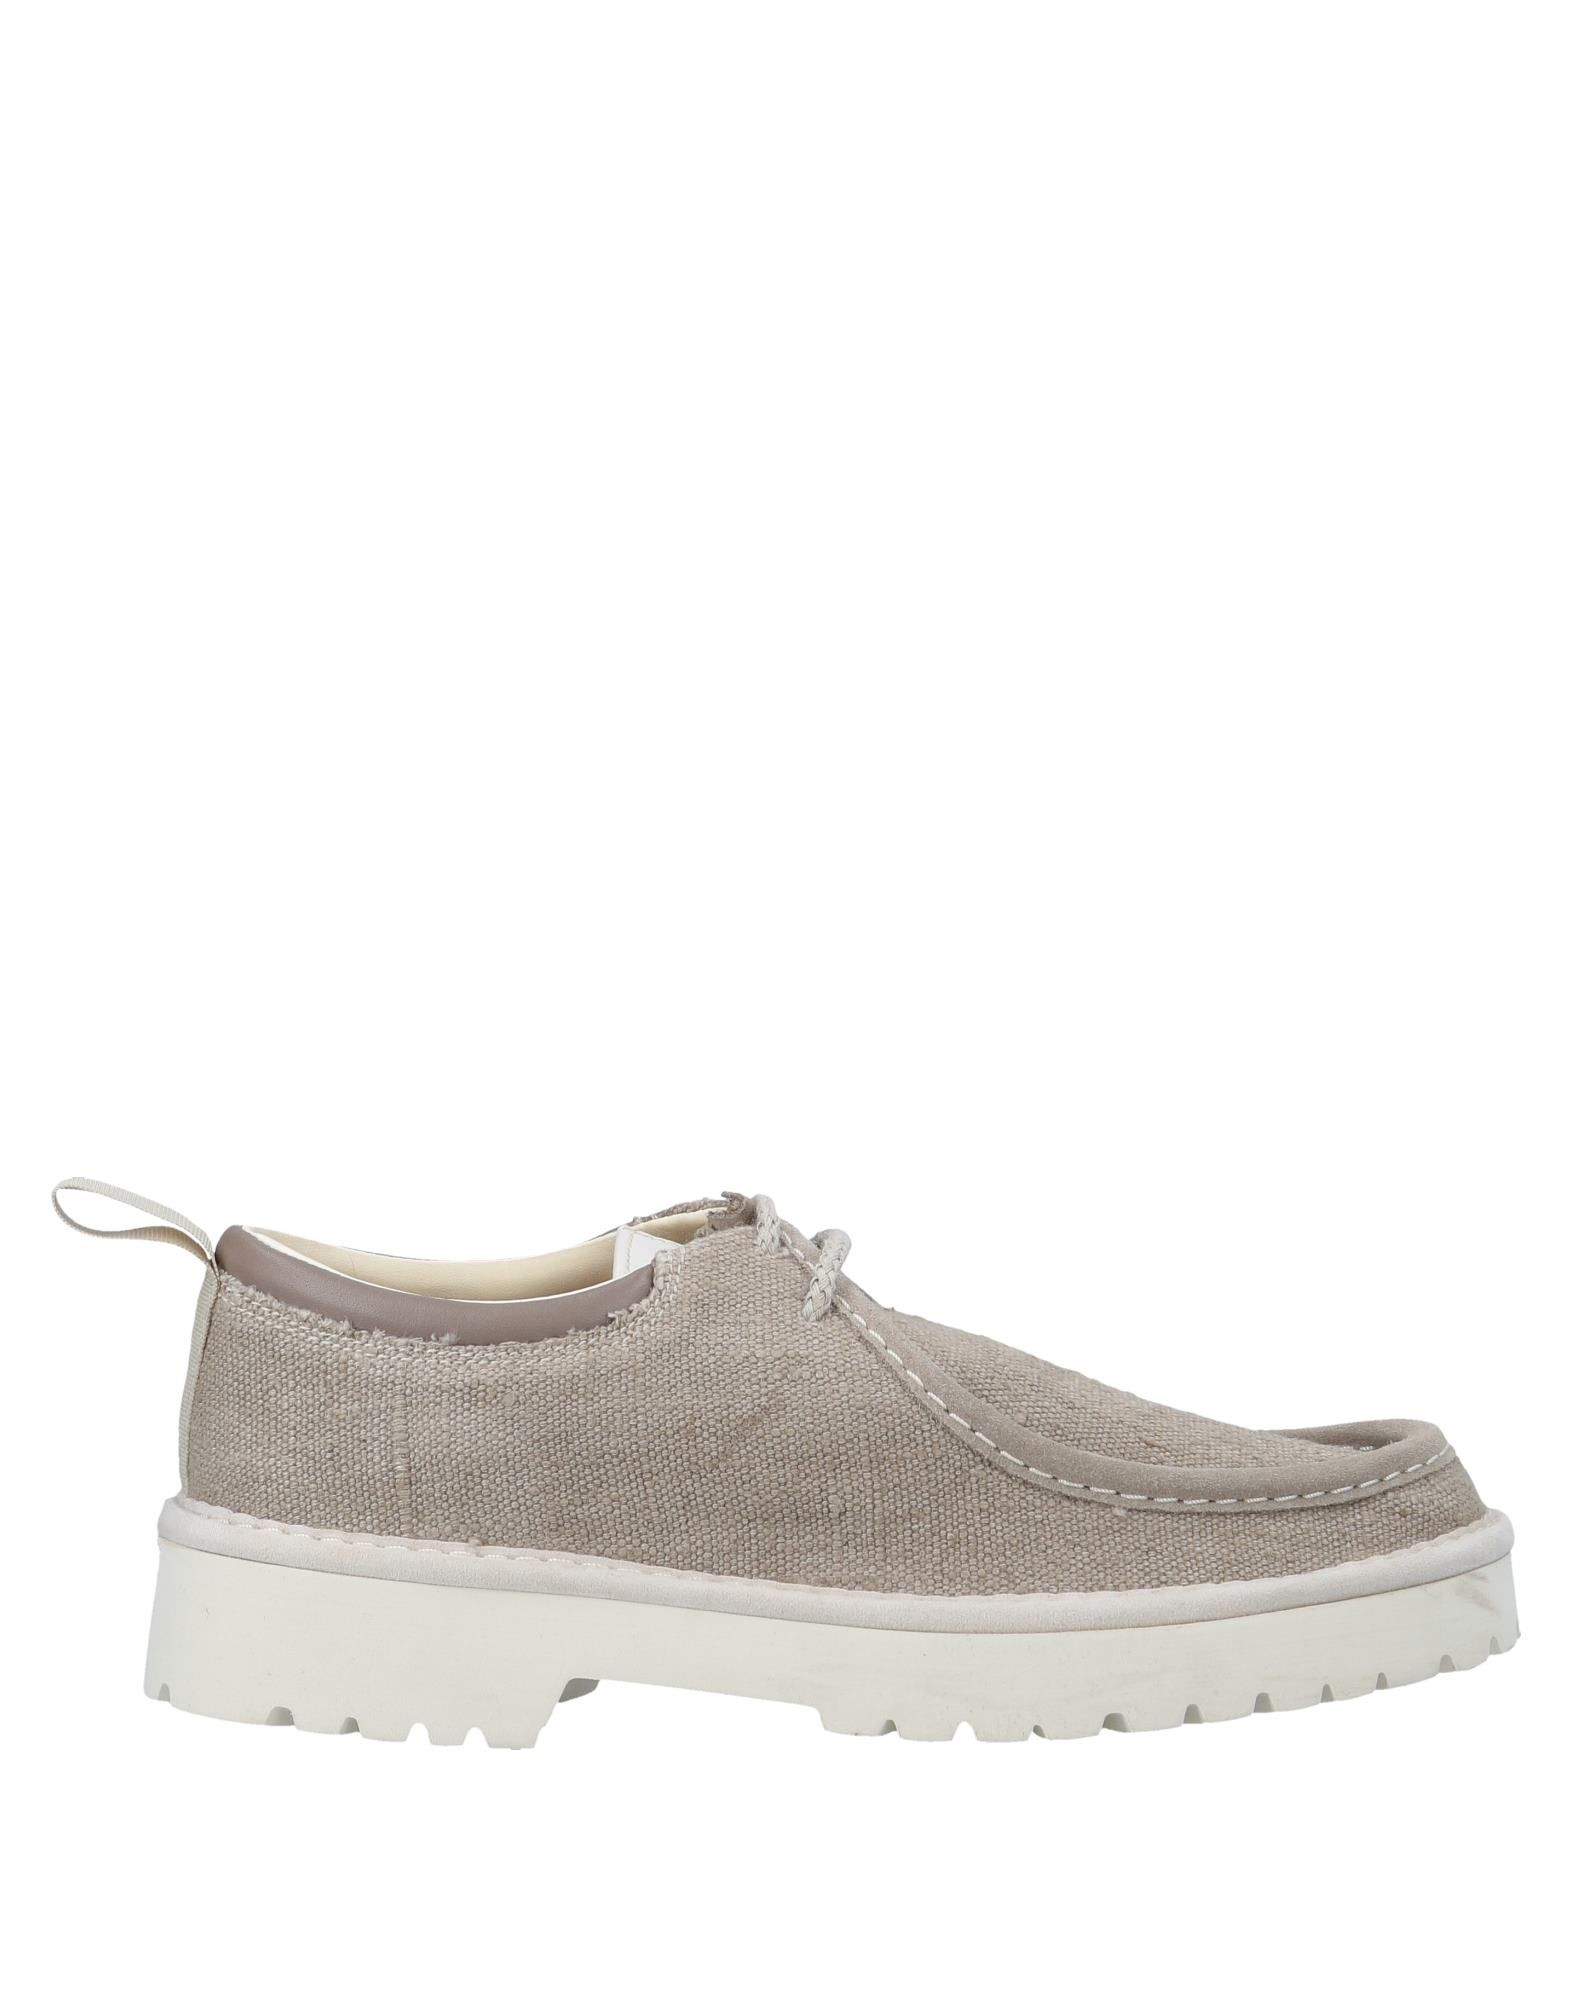 PÀNCHIC Обувь на шнурках